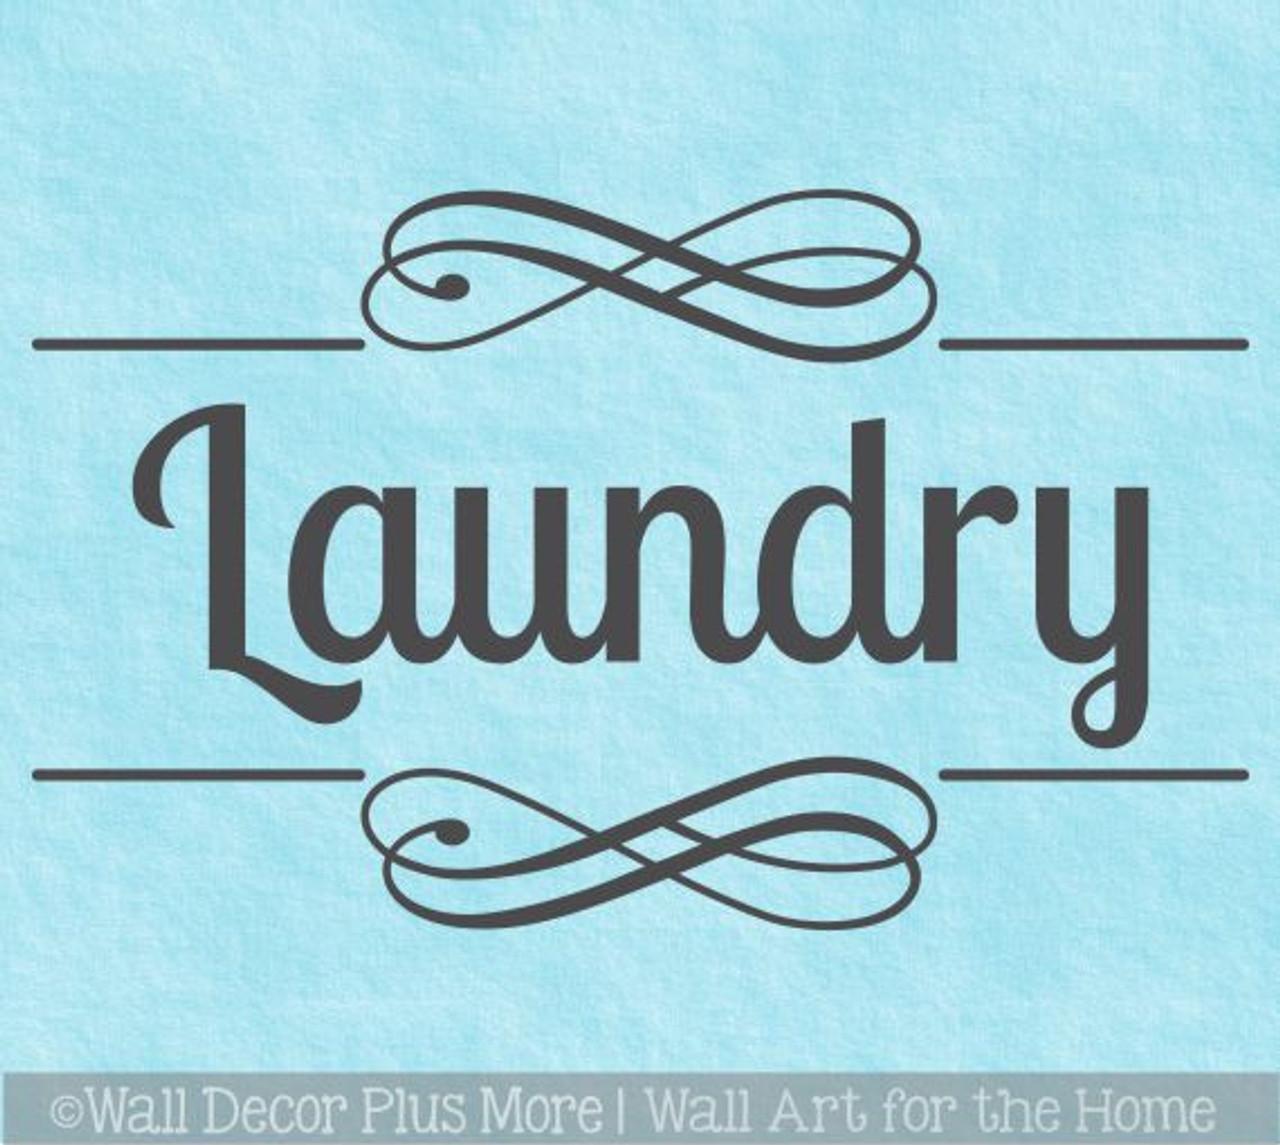 Home Decor Items The Laundry Room Room Door Wall Stickers Vinyl Art Decals Home Furniture Diy Breadcrumbs Ie